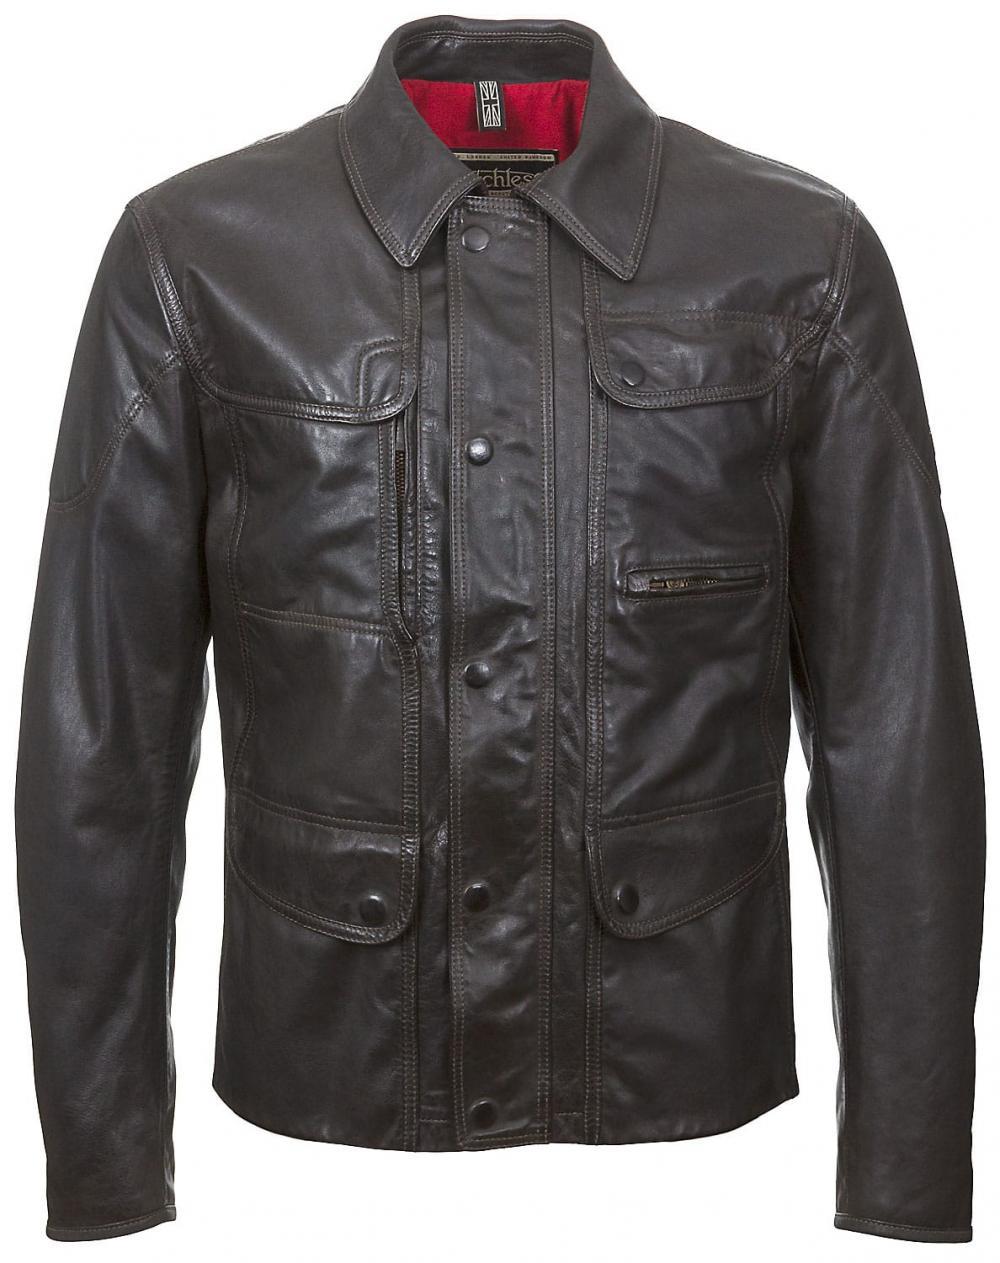 Terminator Jacket